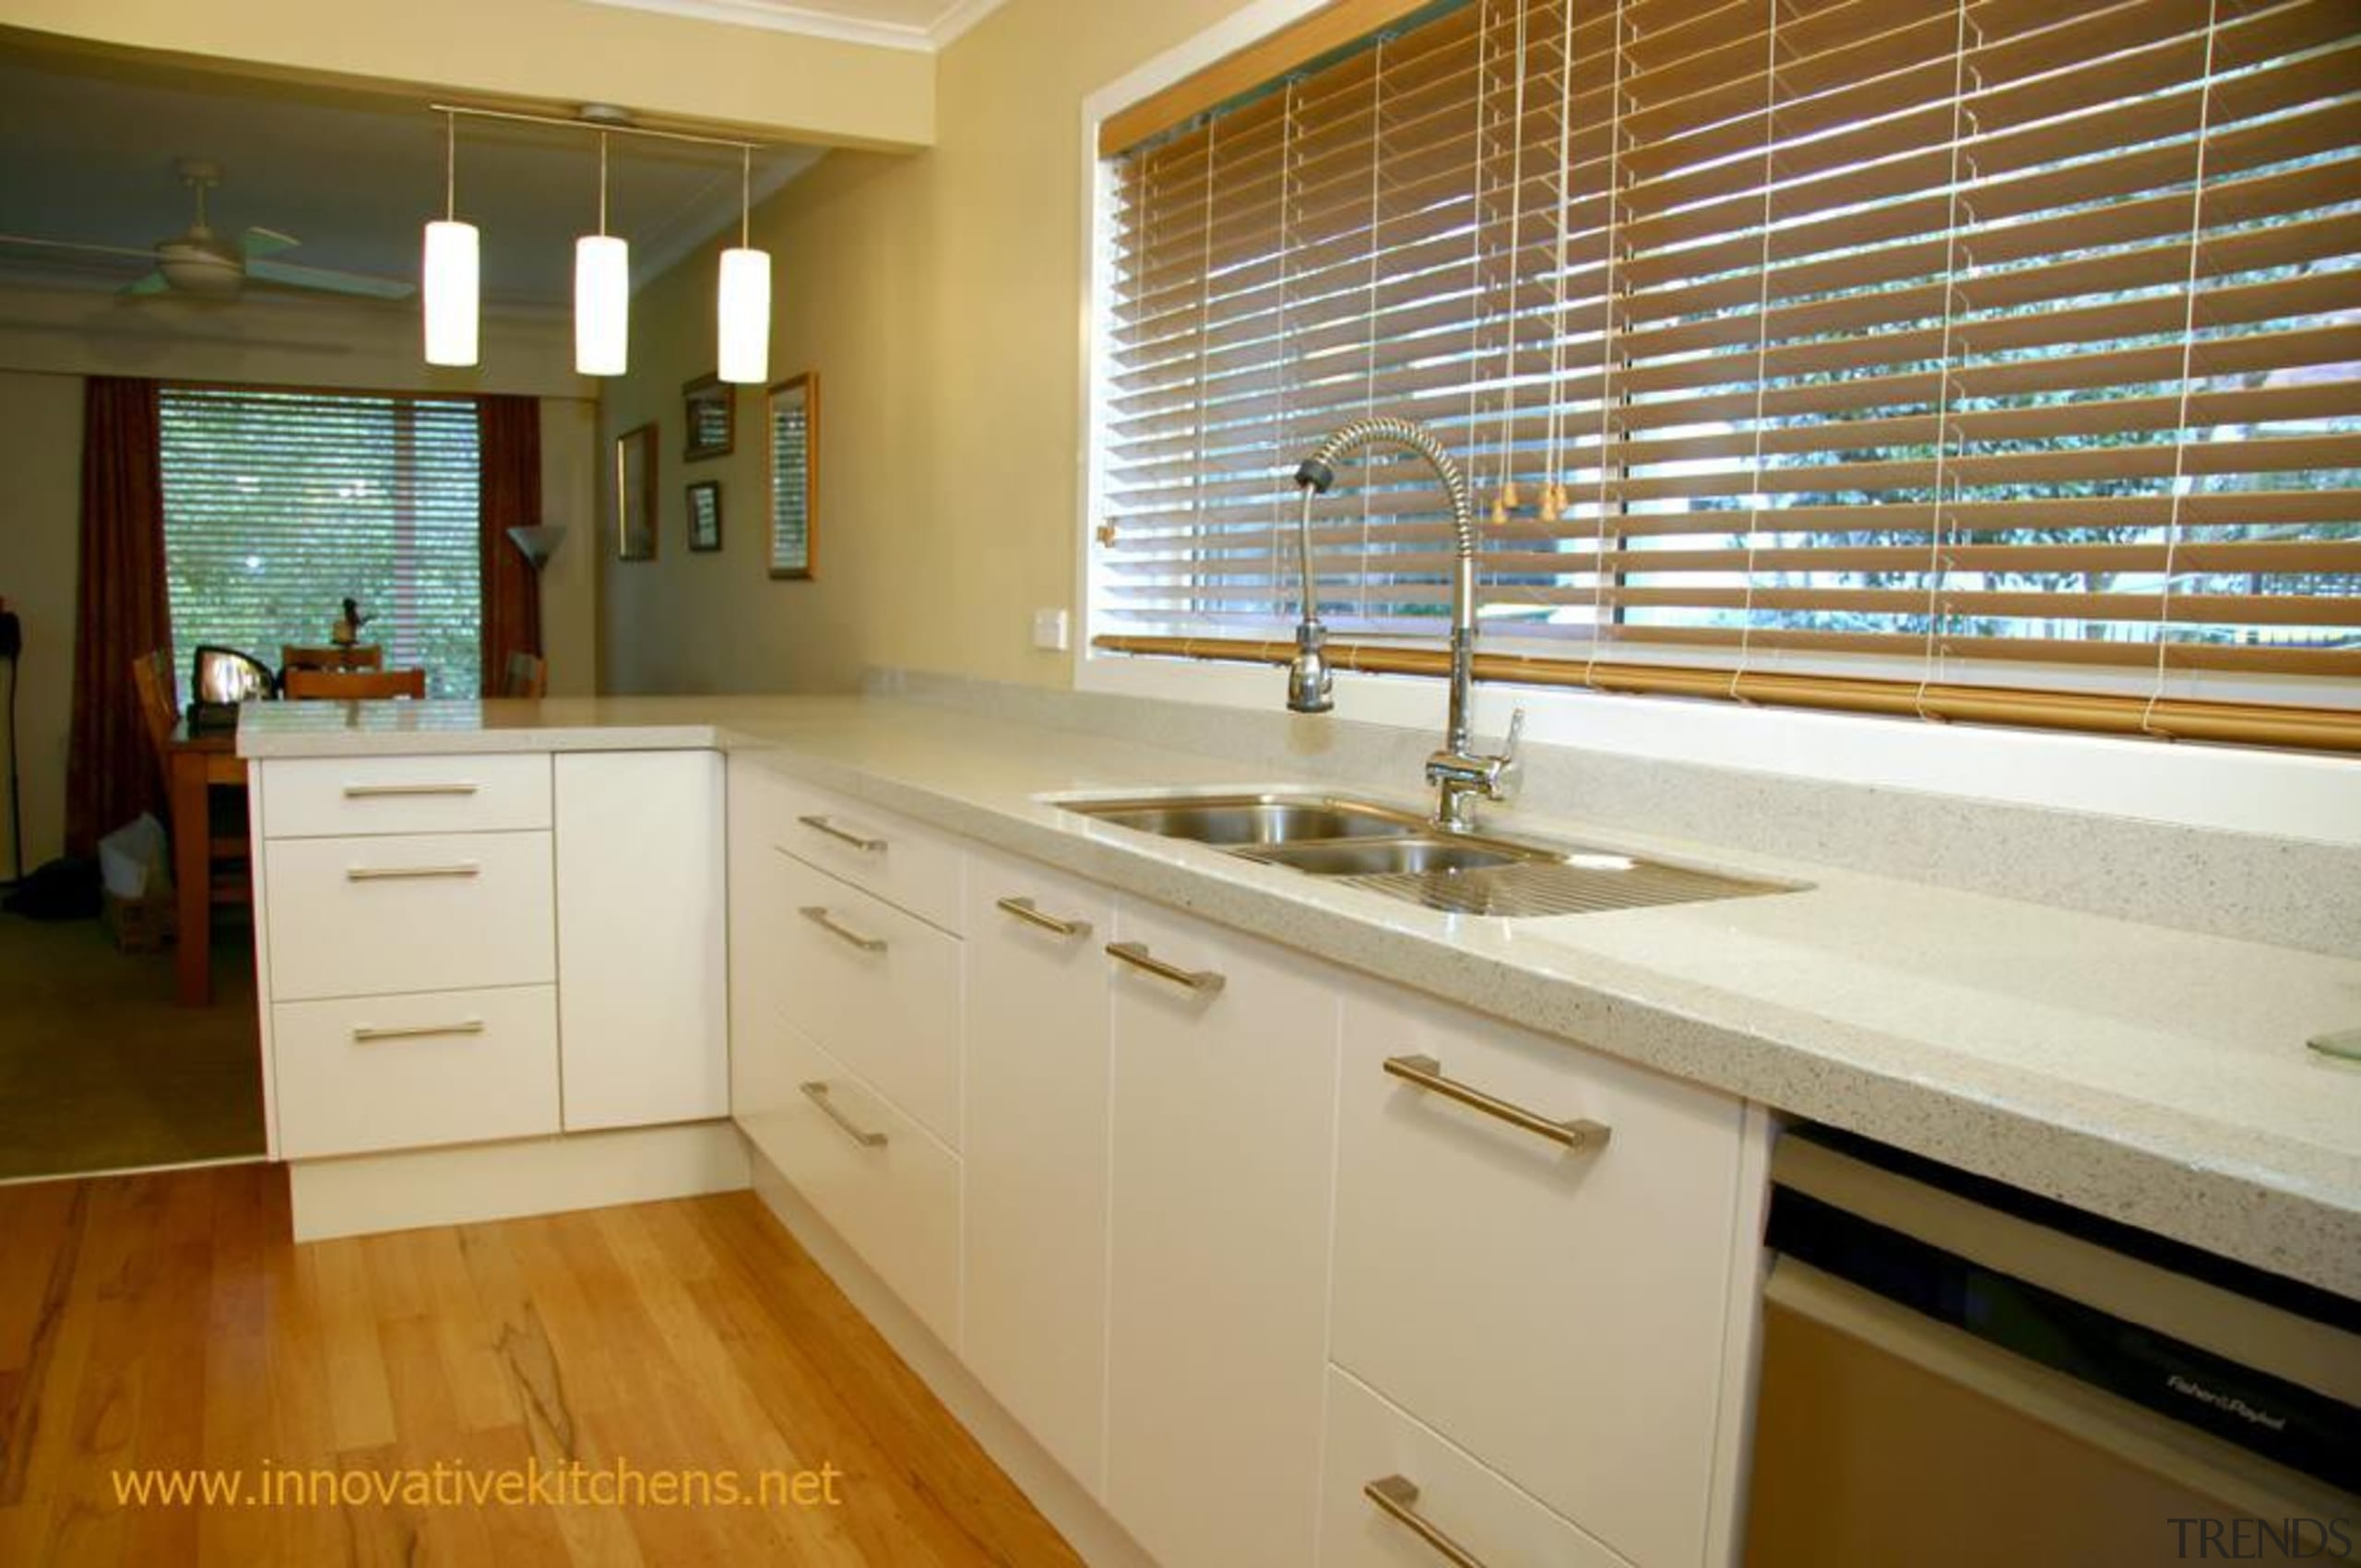 modernbirkenhead5.jpg - modernbirkenhead5.jpg - cabinetry   countertop   cabinetry, countertop, floor, flooring, hardwood, home, interior design, kitchen, property, real estate, room, window, wood, brown, orange